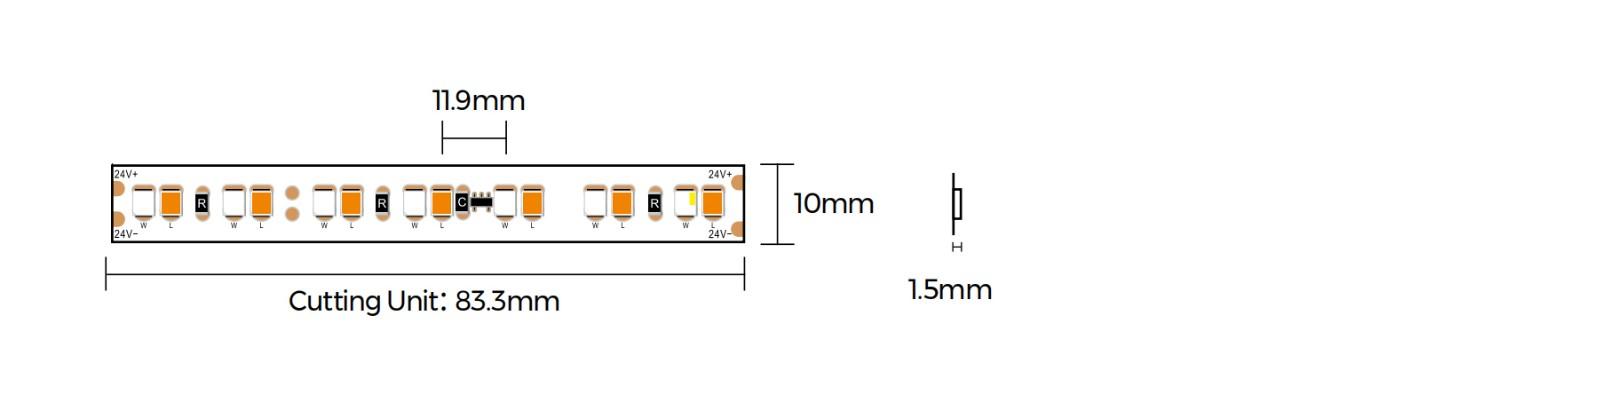 DT8168SWW-24V-10mm